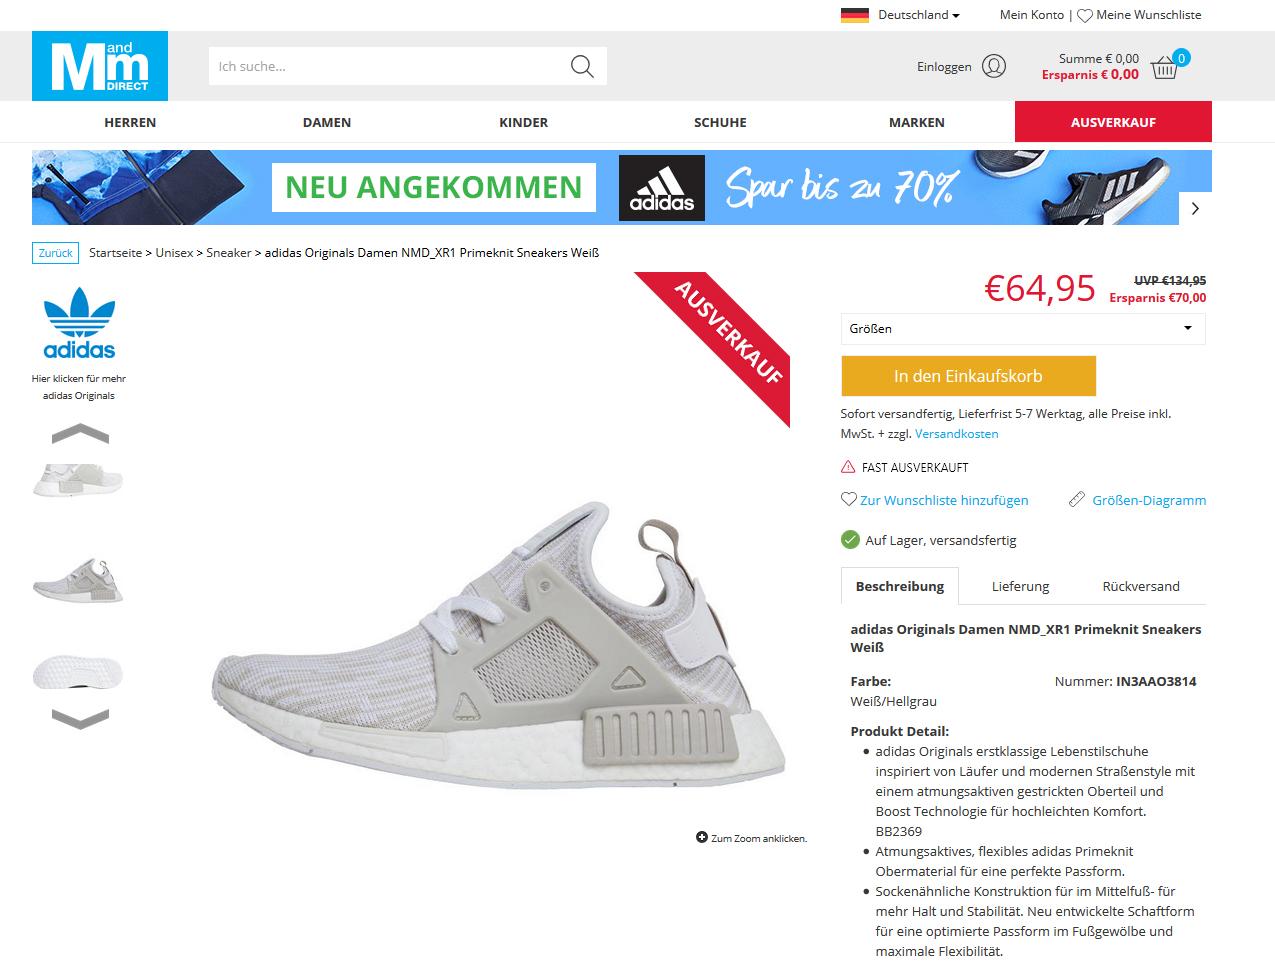 adidas Originals Damen NMD_XR1 Primeknit Sneakers Weiß3